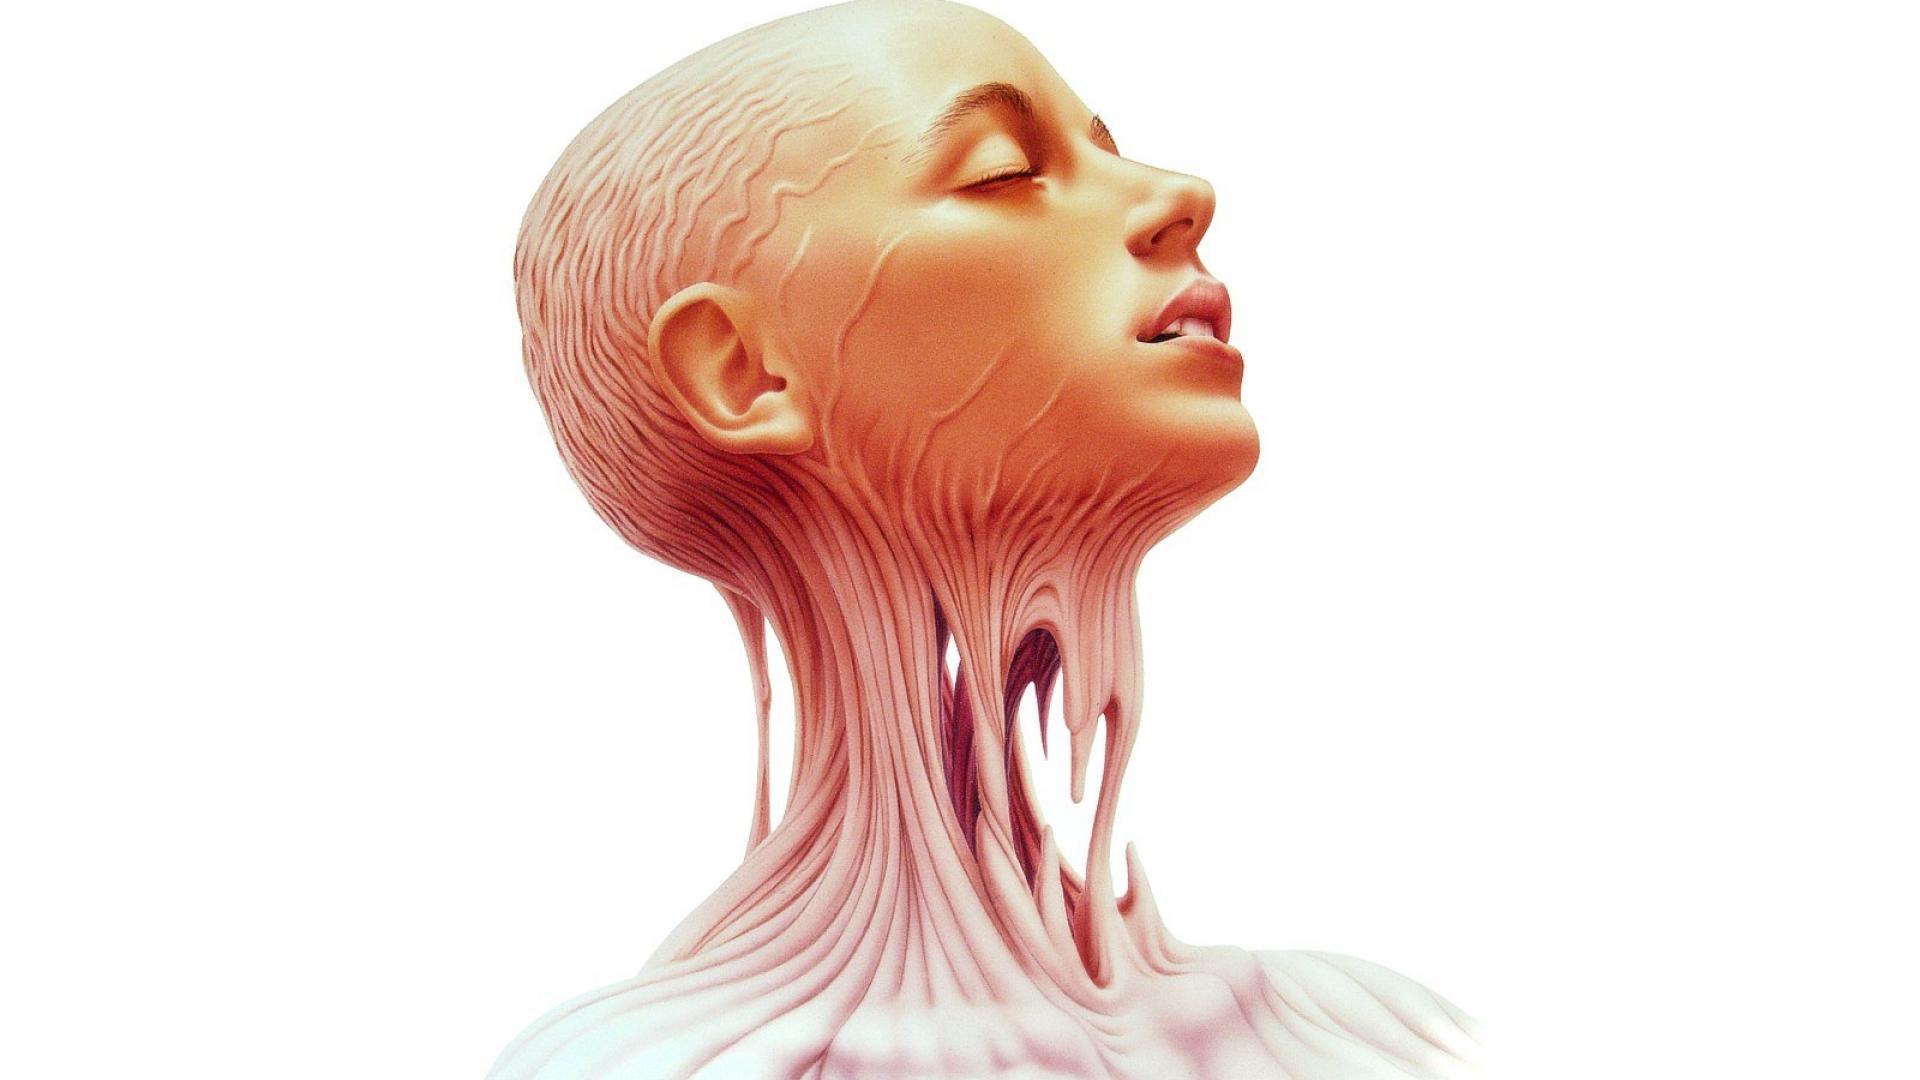 Anatomy human body face girl wallpaper   1920x1080   121903 ...